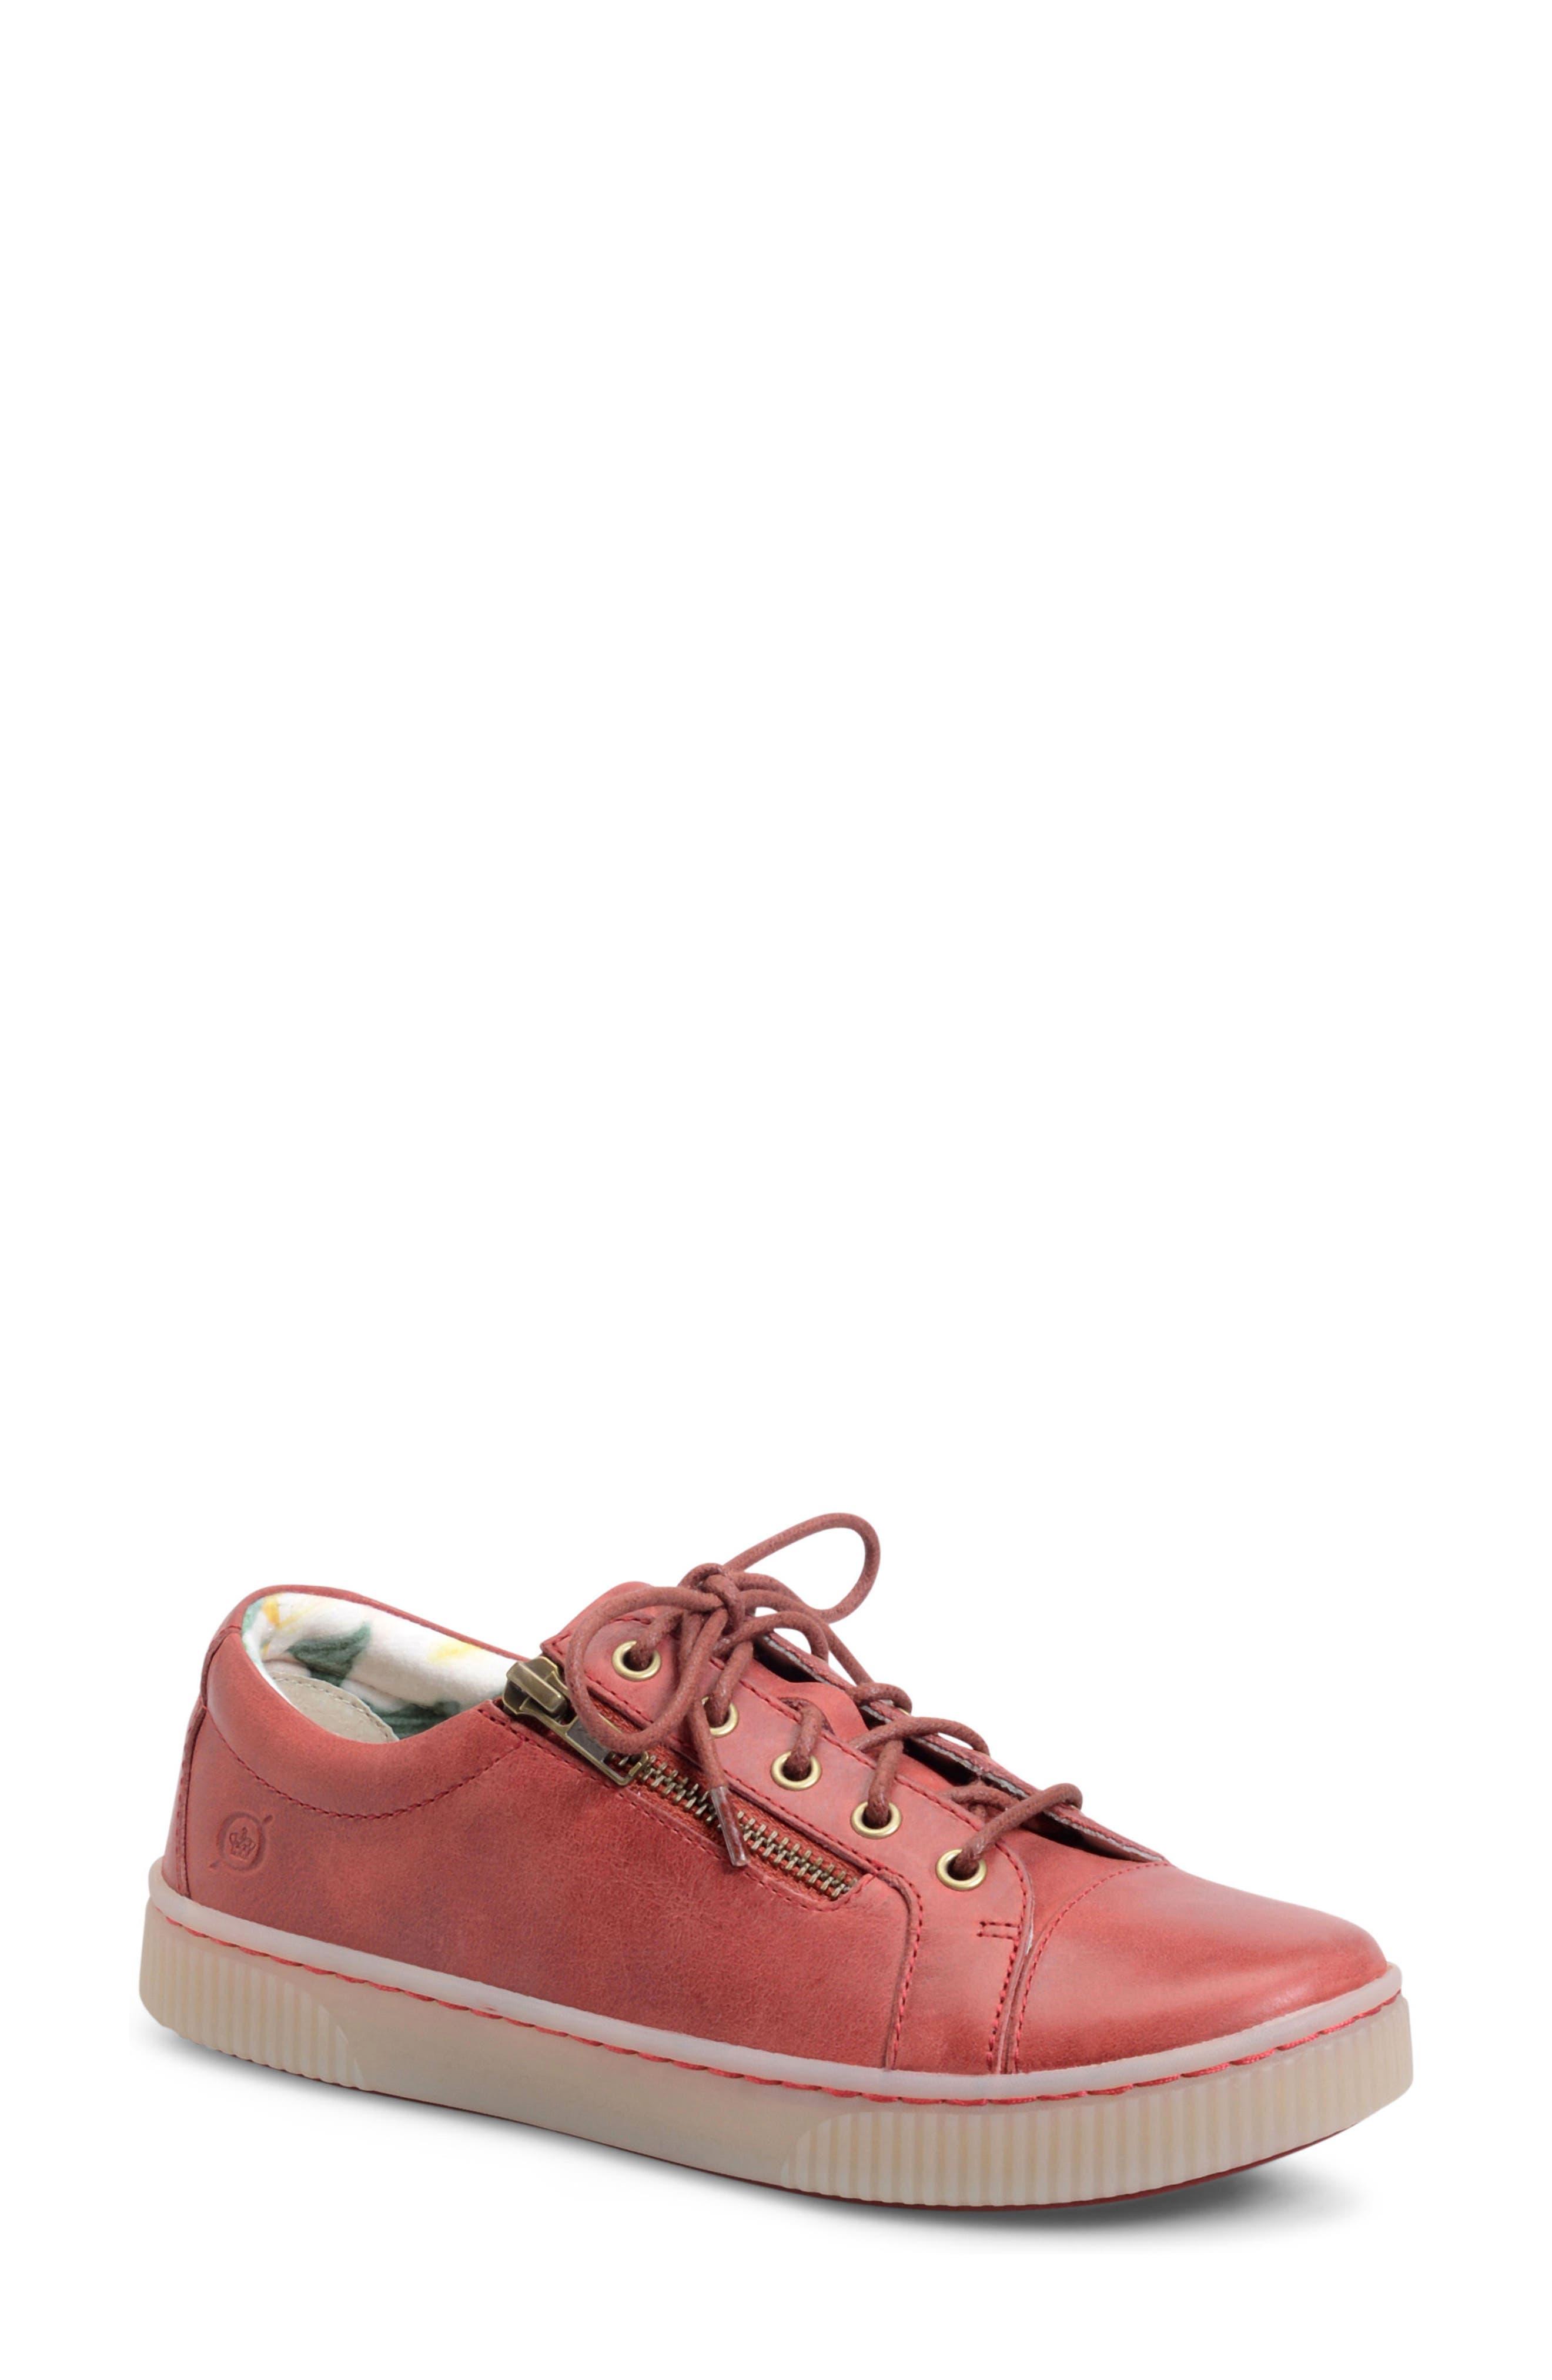 Børn Tamara Platform Sneaker (Women)